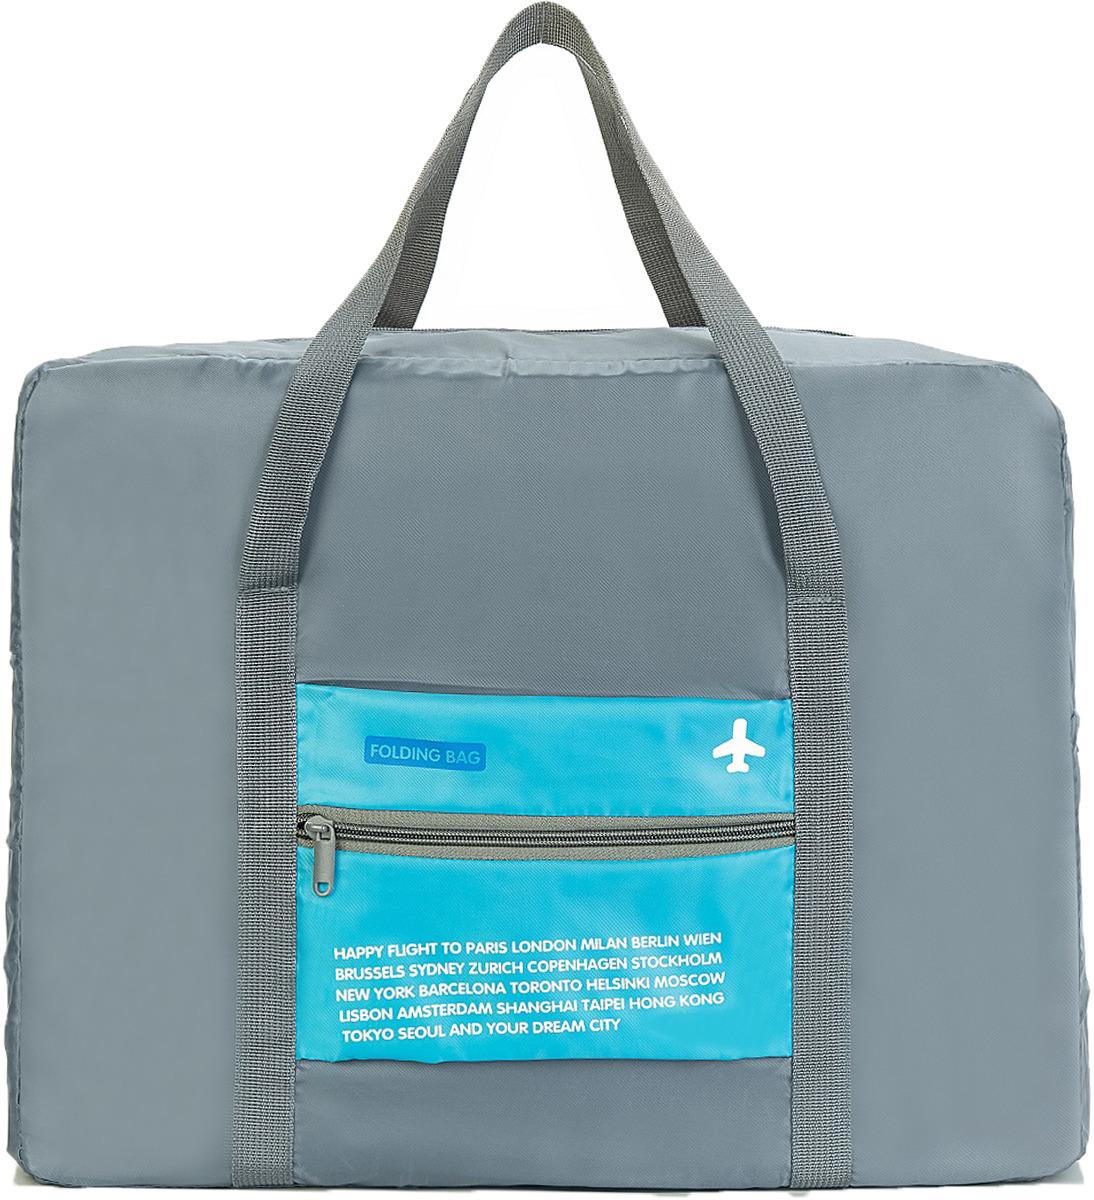 Сумка дорожная Routemark TFB03, цвет: синий